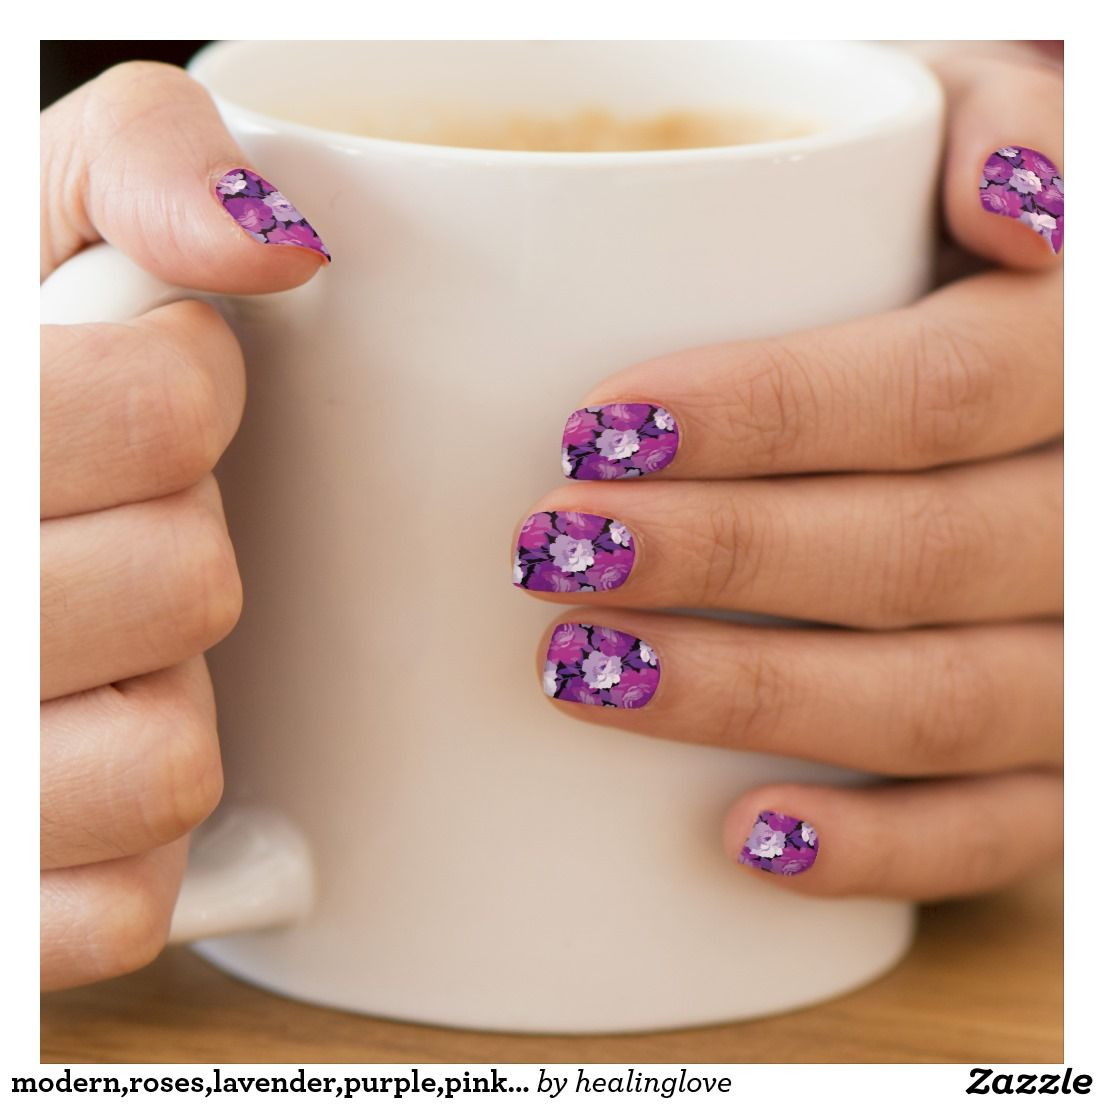 modern,roses,lavender,purple,pink,magnolia,elegant  Minx® nail art